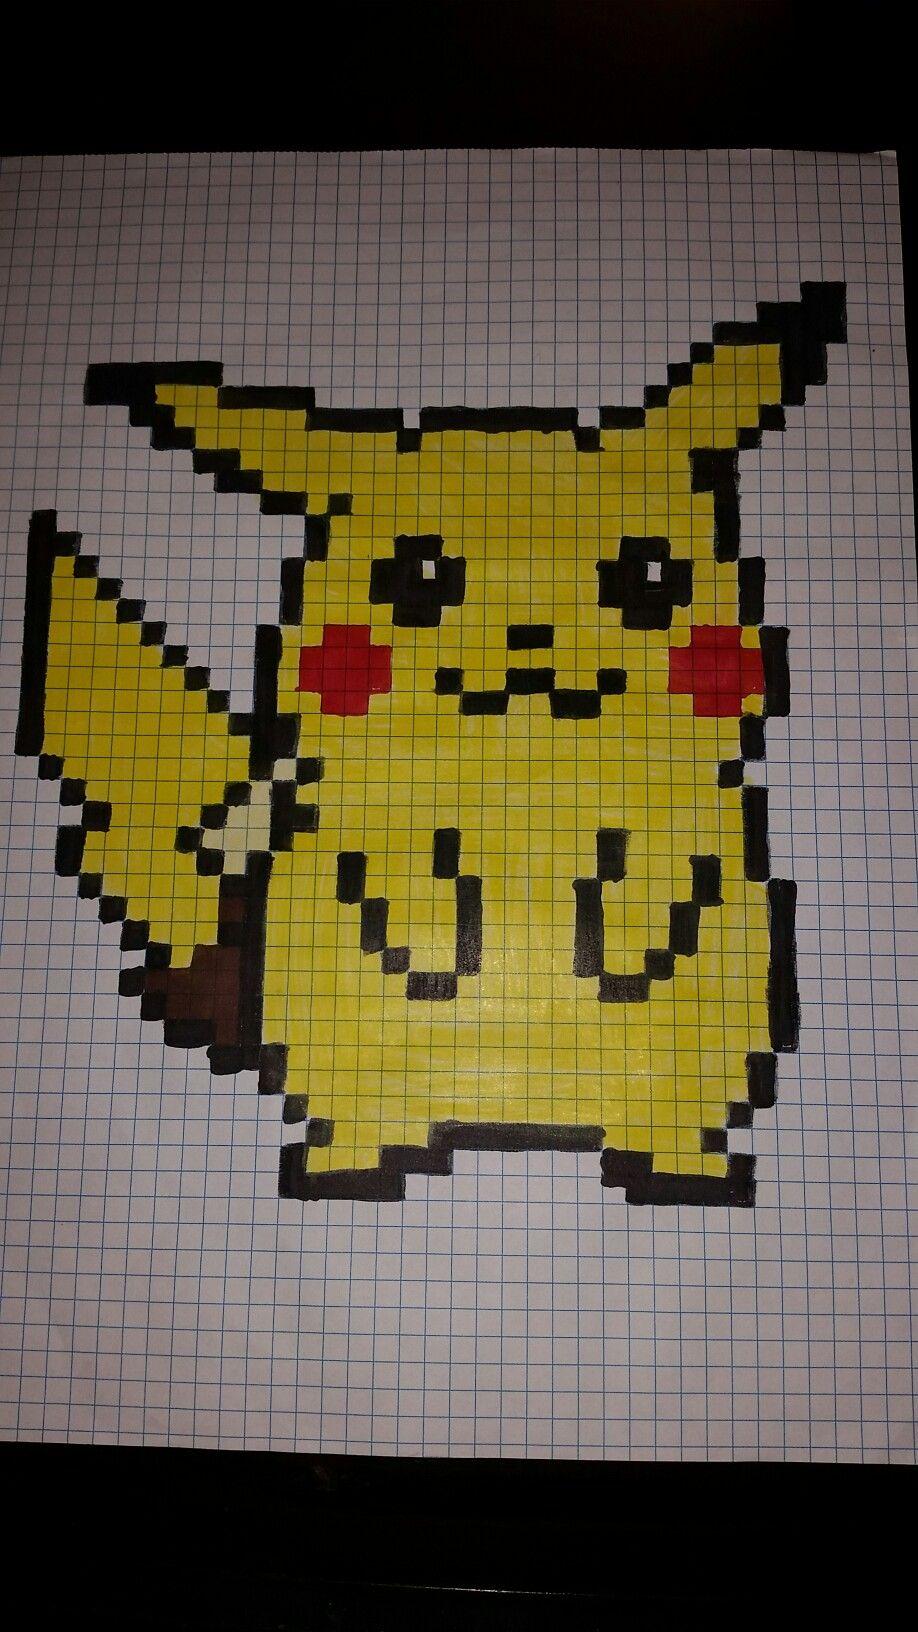 Pin Pikachu Pixel Art Mineboard Year Of Clean Water